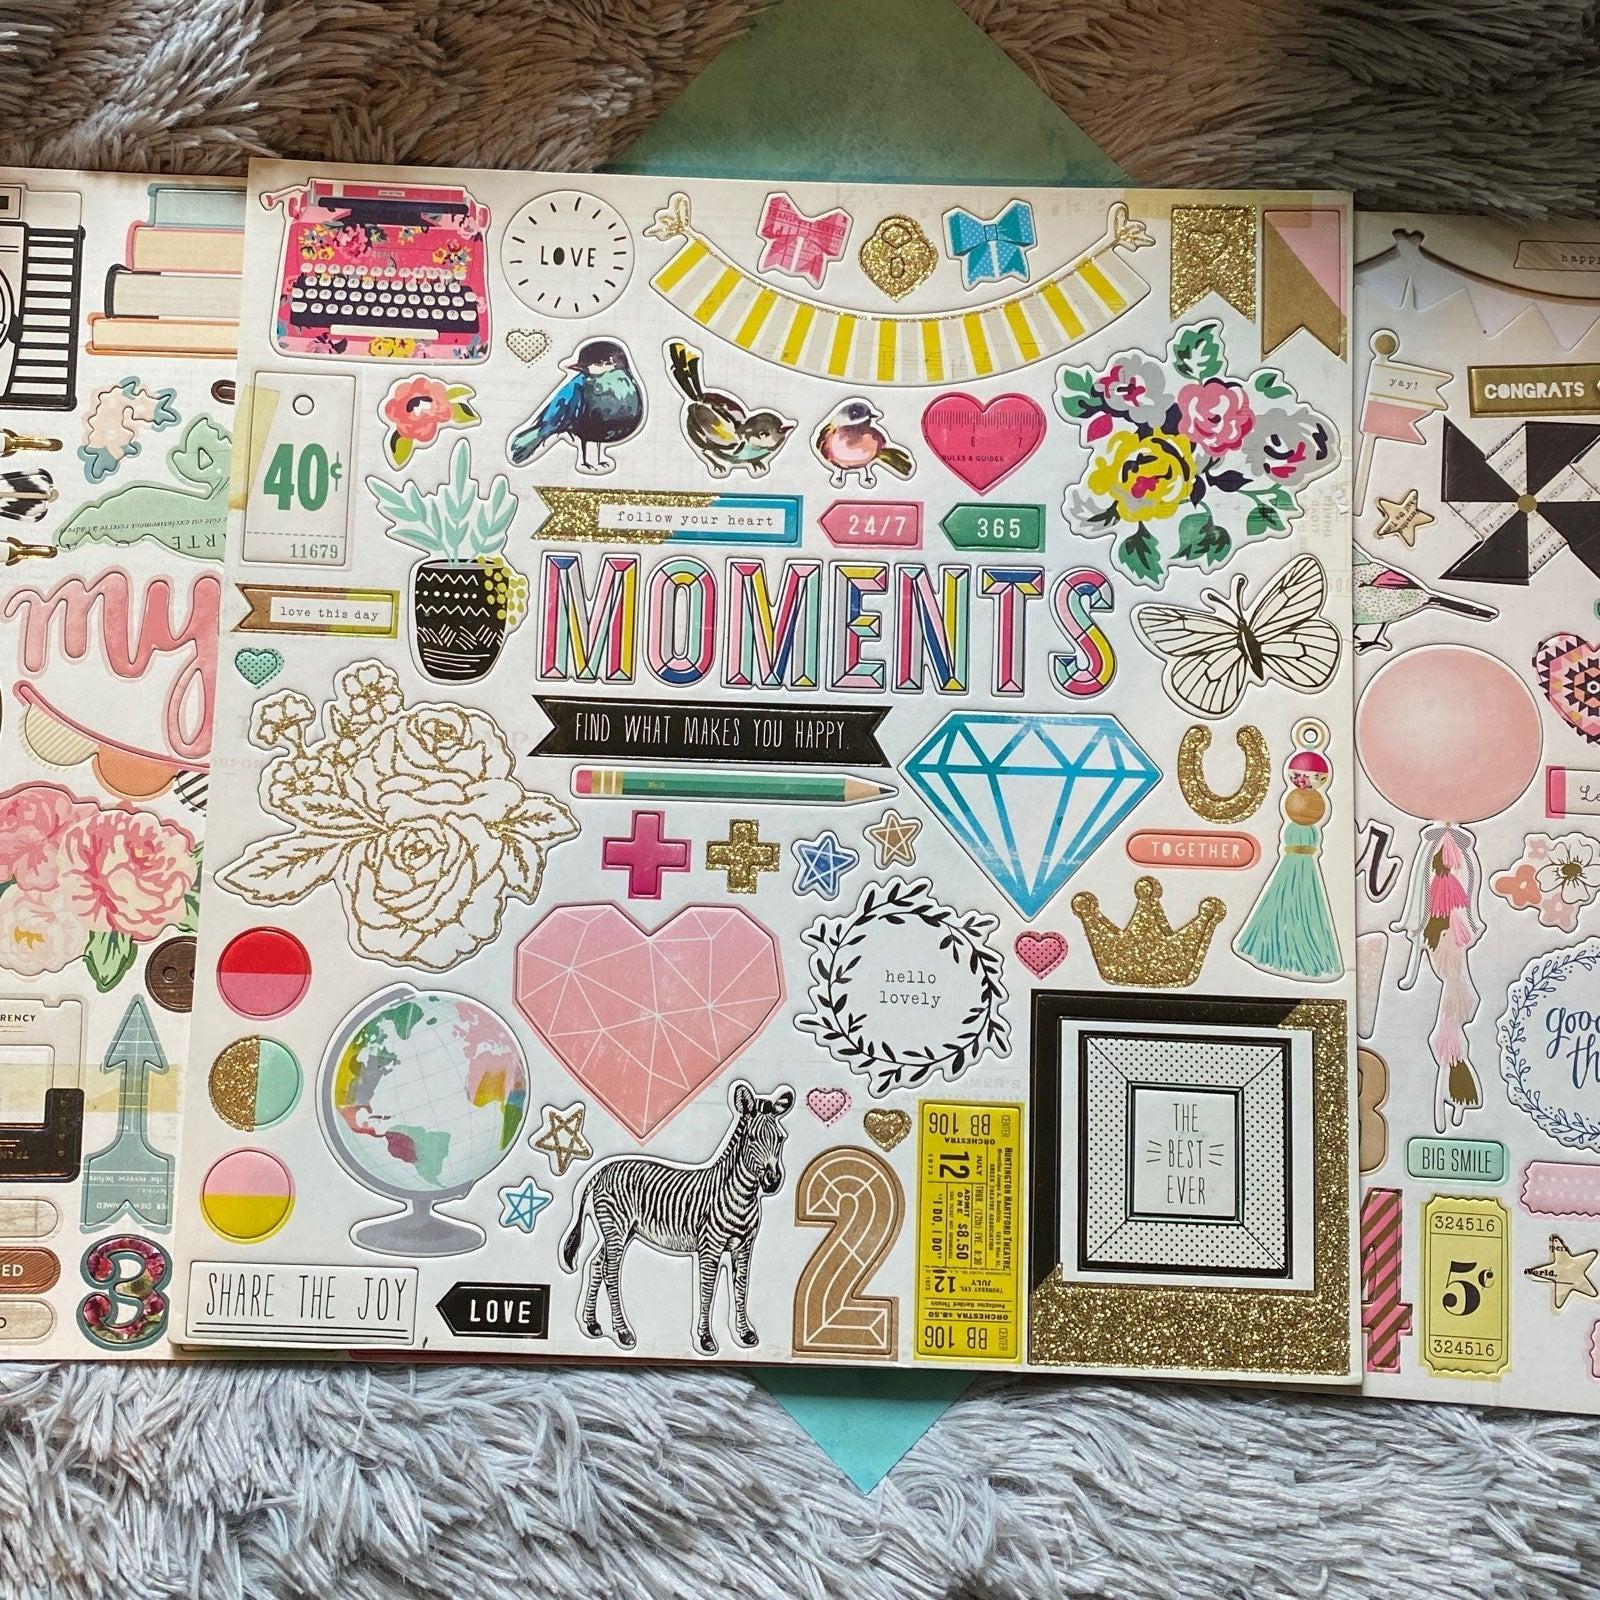 Crate paper chipboard stickers